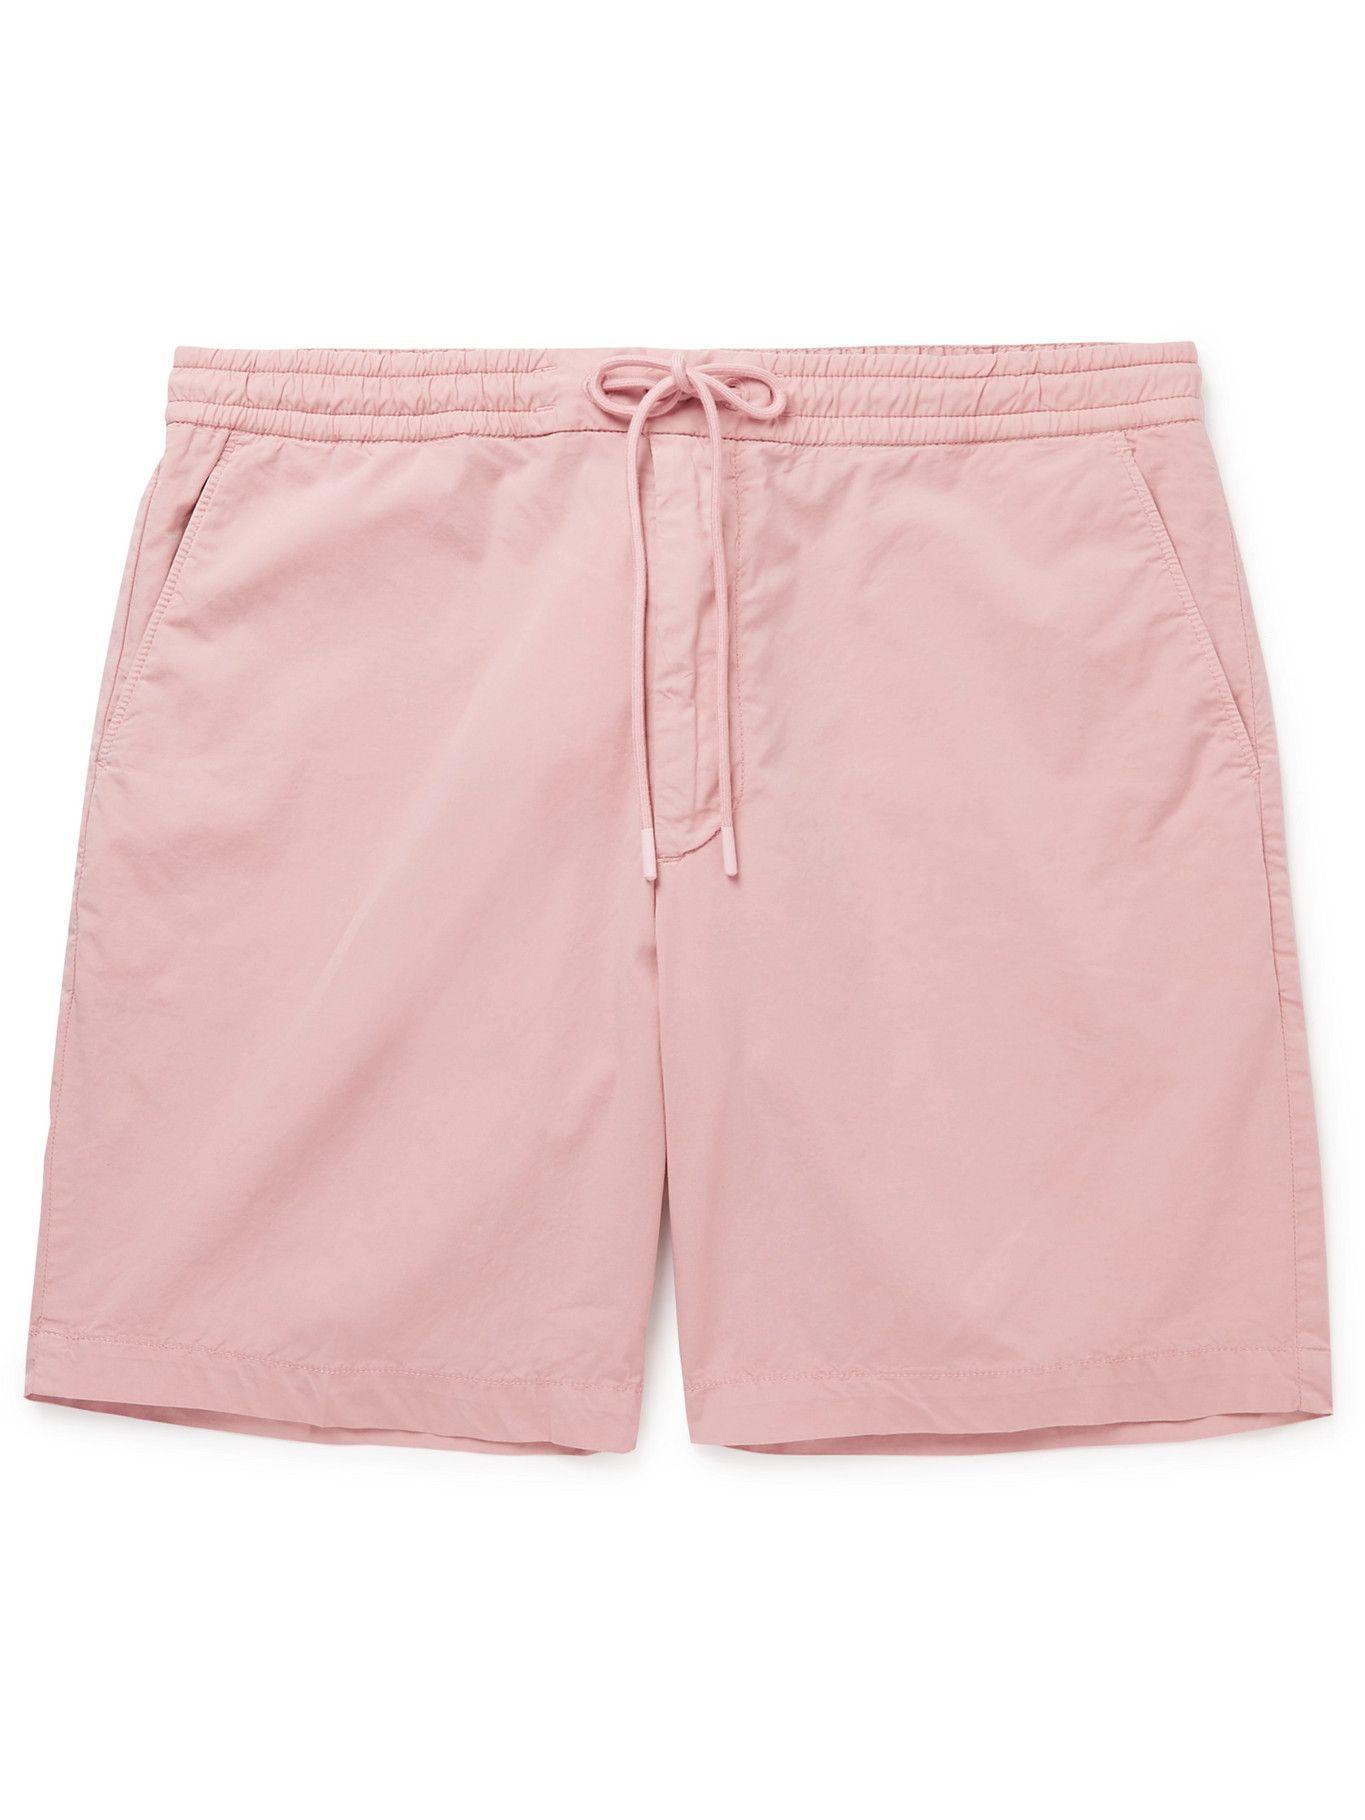 HUGO BOSS - Kenso Wide-Leg Stretch-Cotton Poplin Drawstring Shorts - Pink